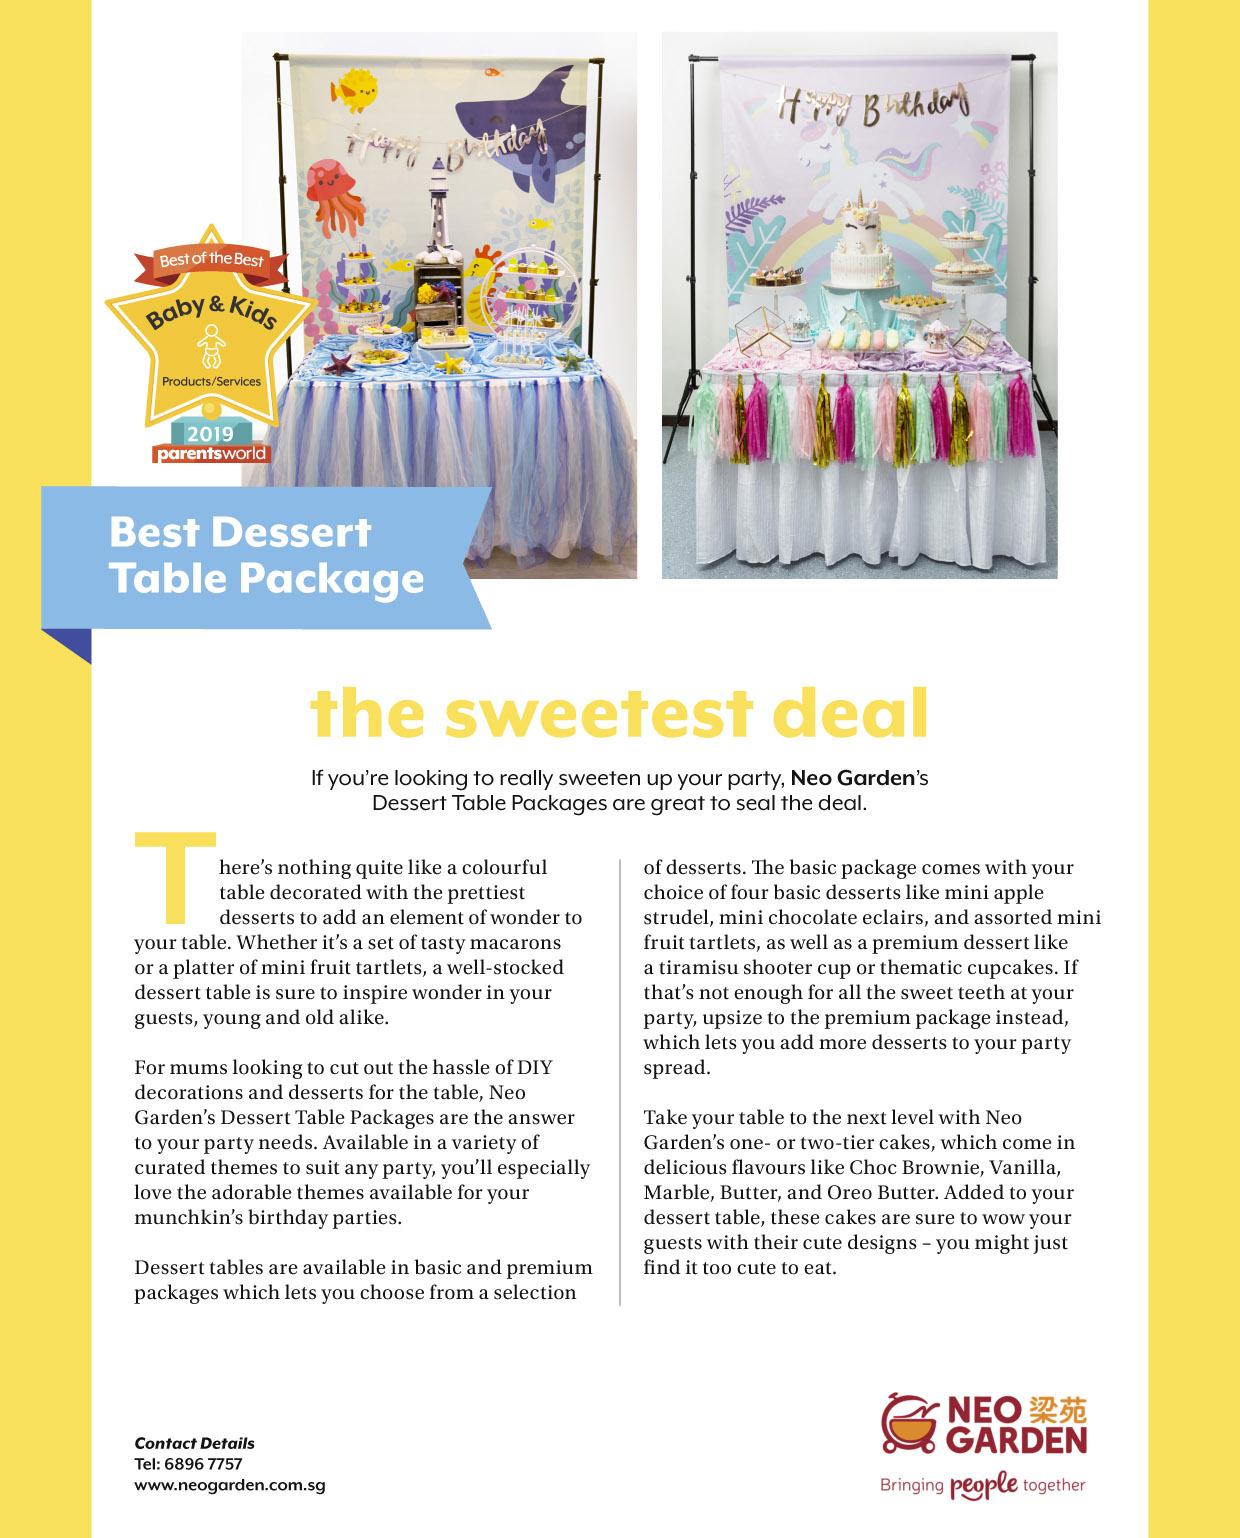 Best Dessert Table Package - Parents World